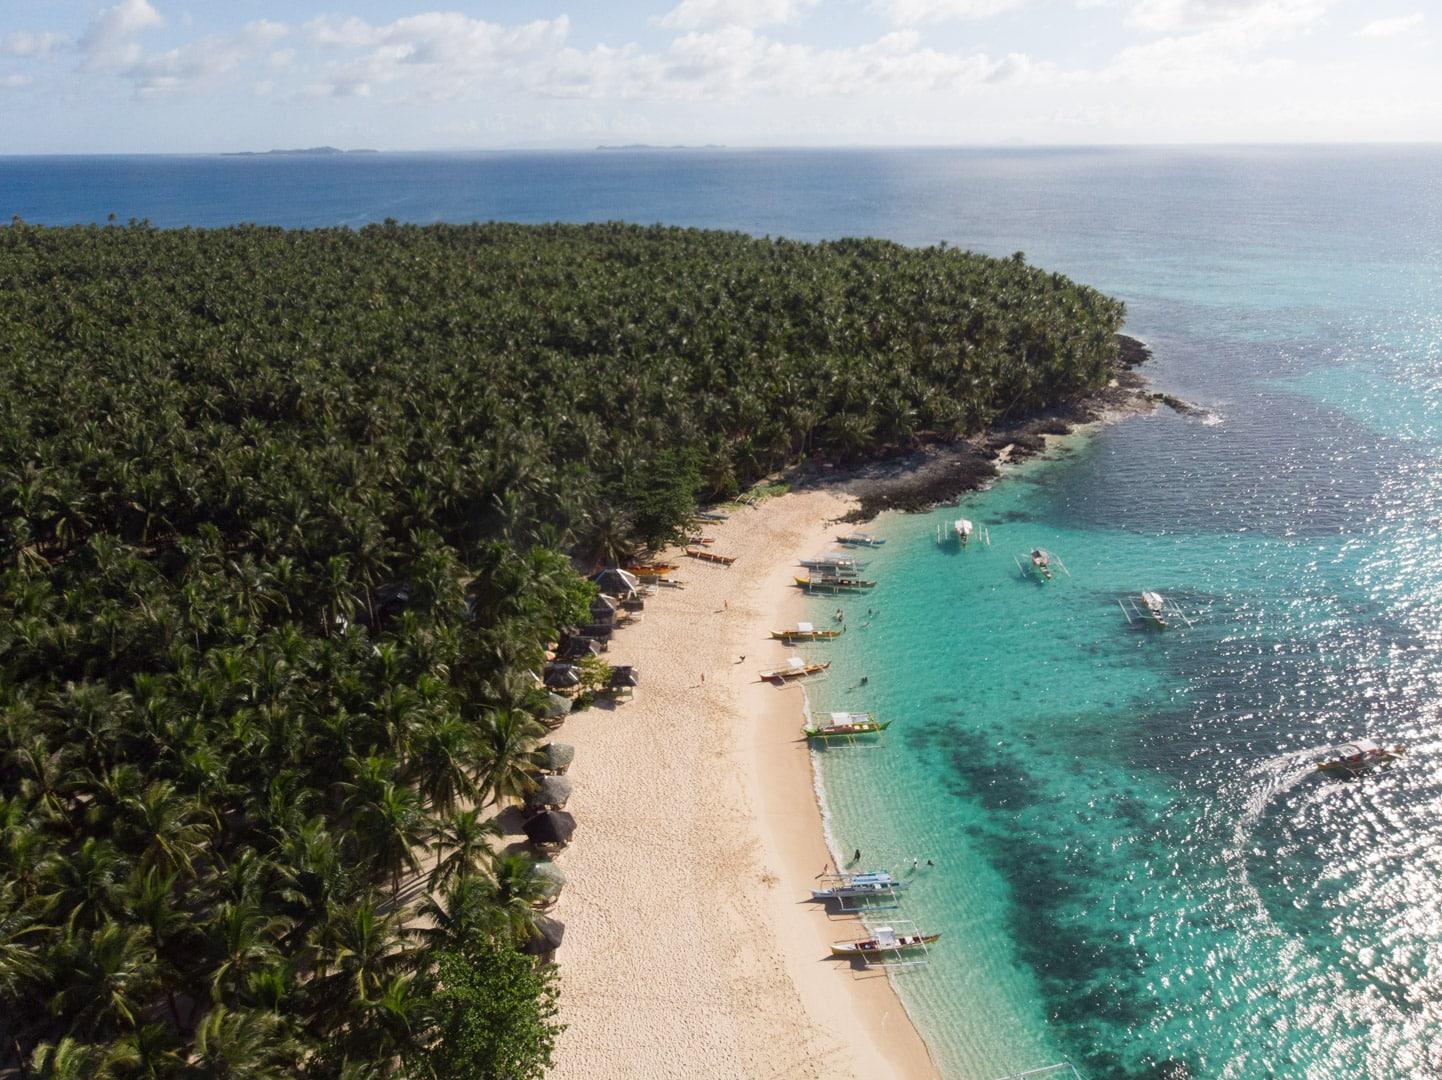 How to get to Sohoton Cove, Siargao Island, Daku Island